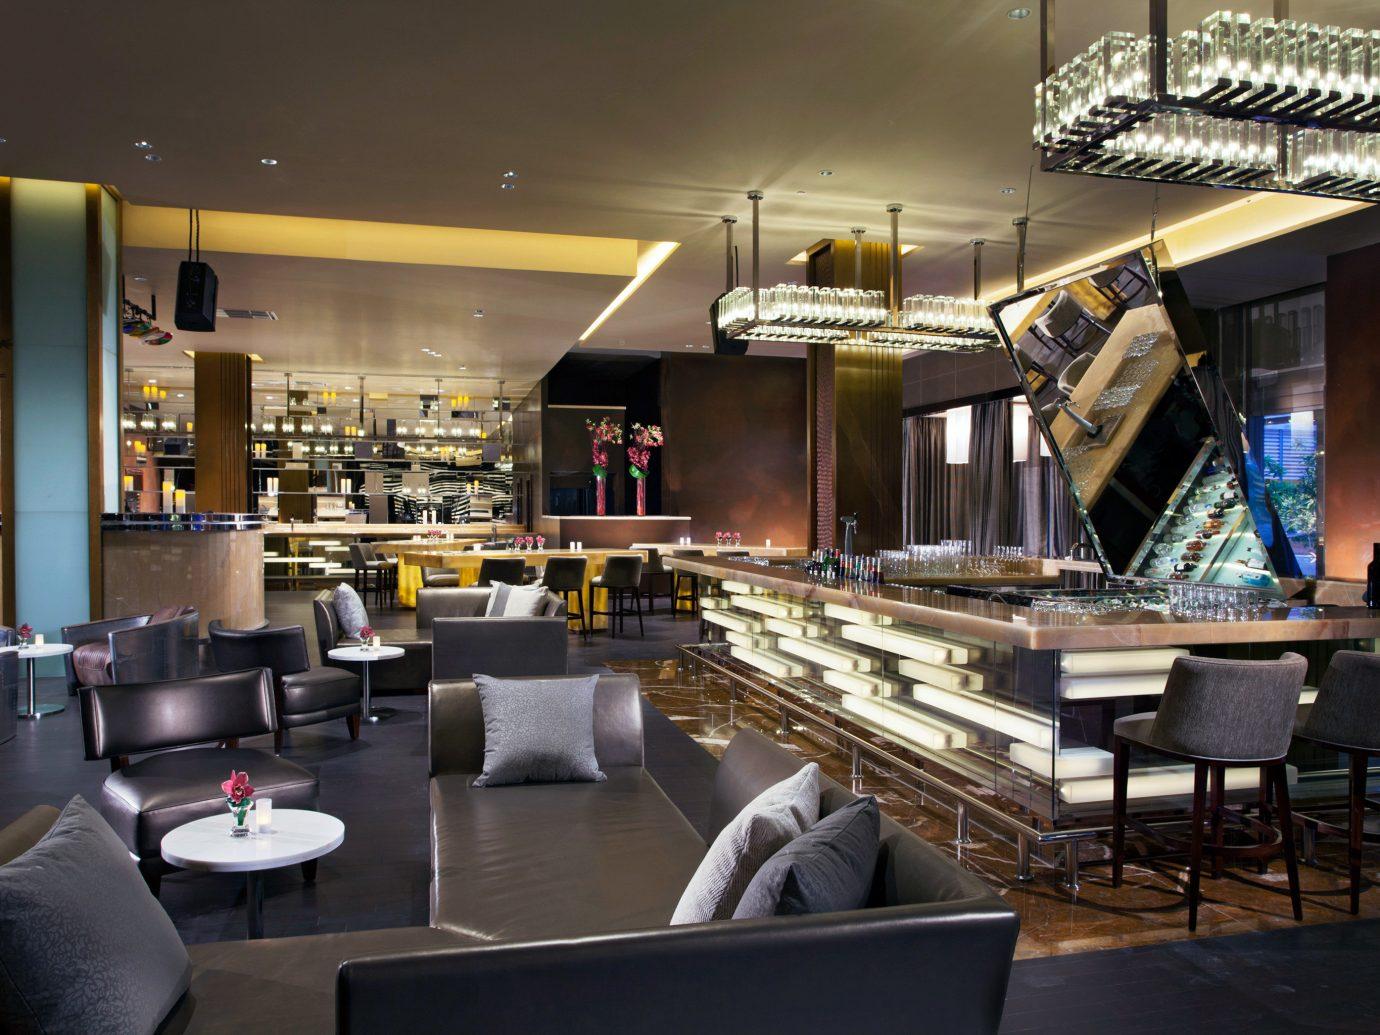 Bar Dining Drink Eat Hotels Living Lounge Luxury Modern Romantic indoor floor room ceiling restaurant interior design meal café furniture coffeehouse area several